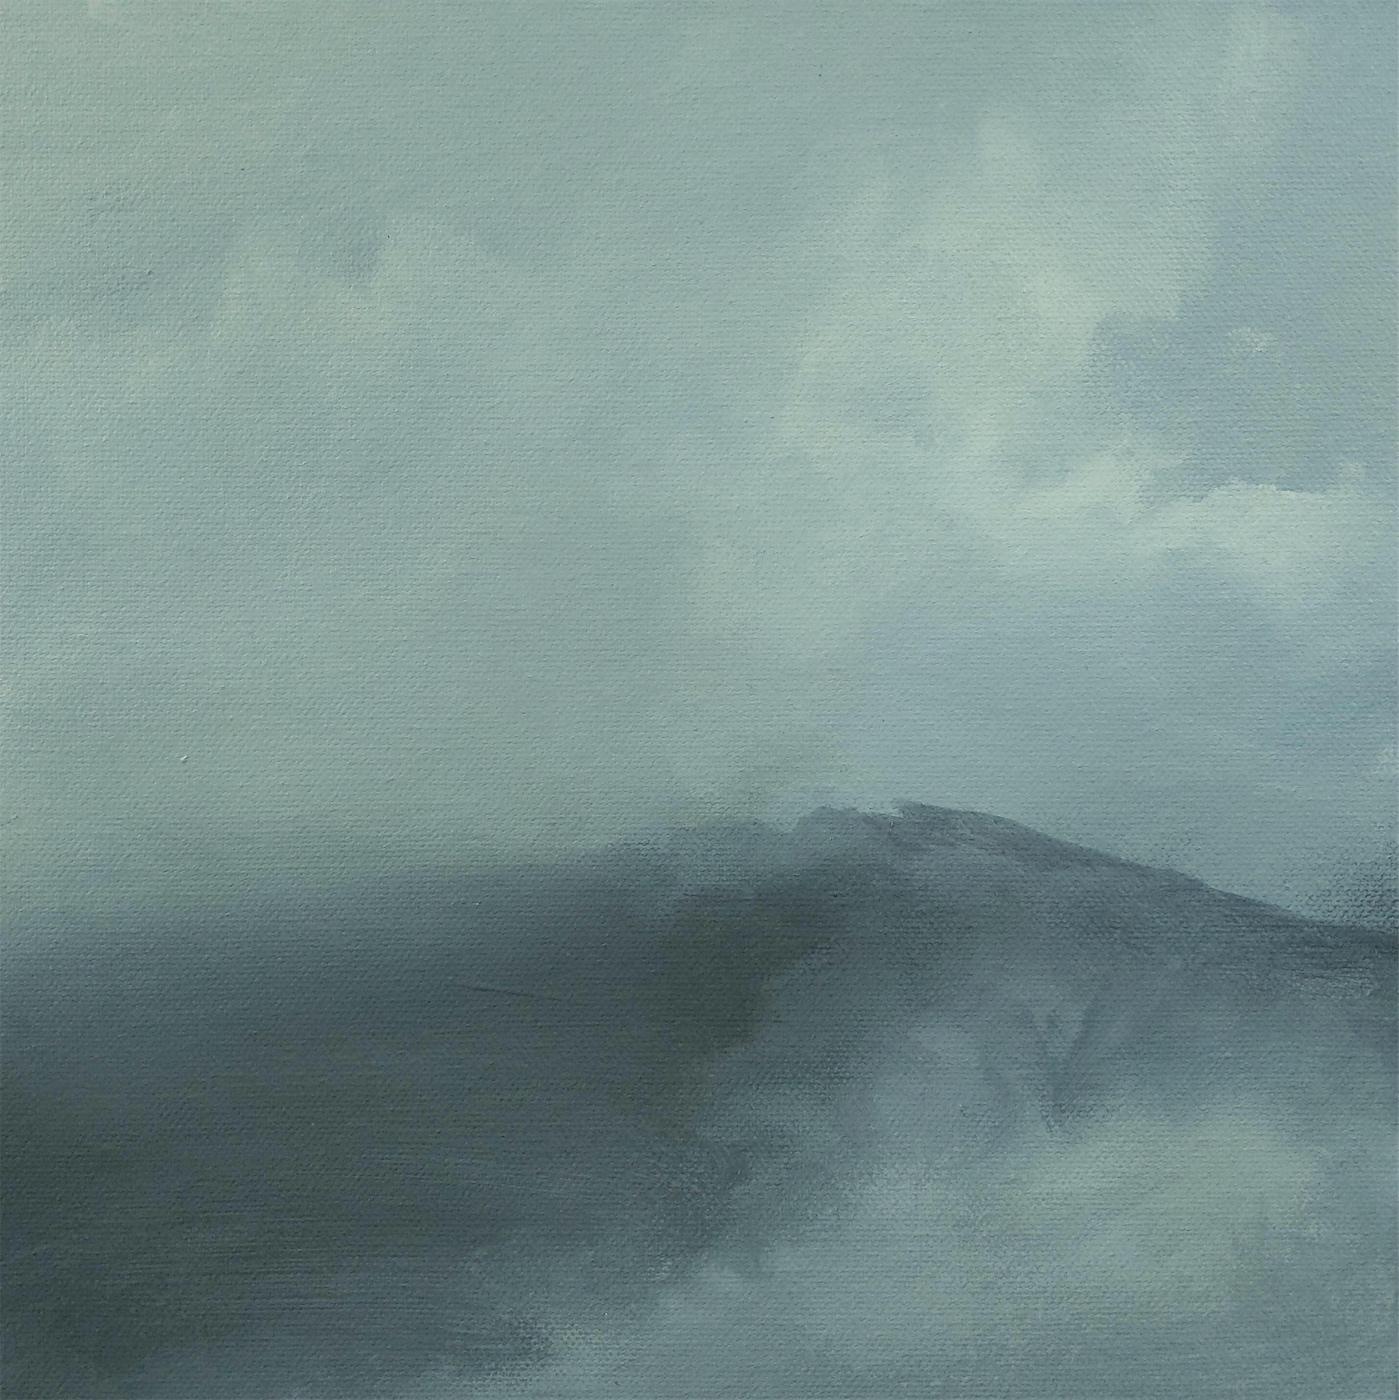 Gareth Buxton, Hazy Winter Edge